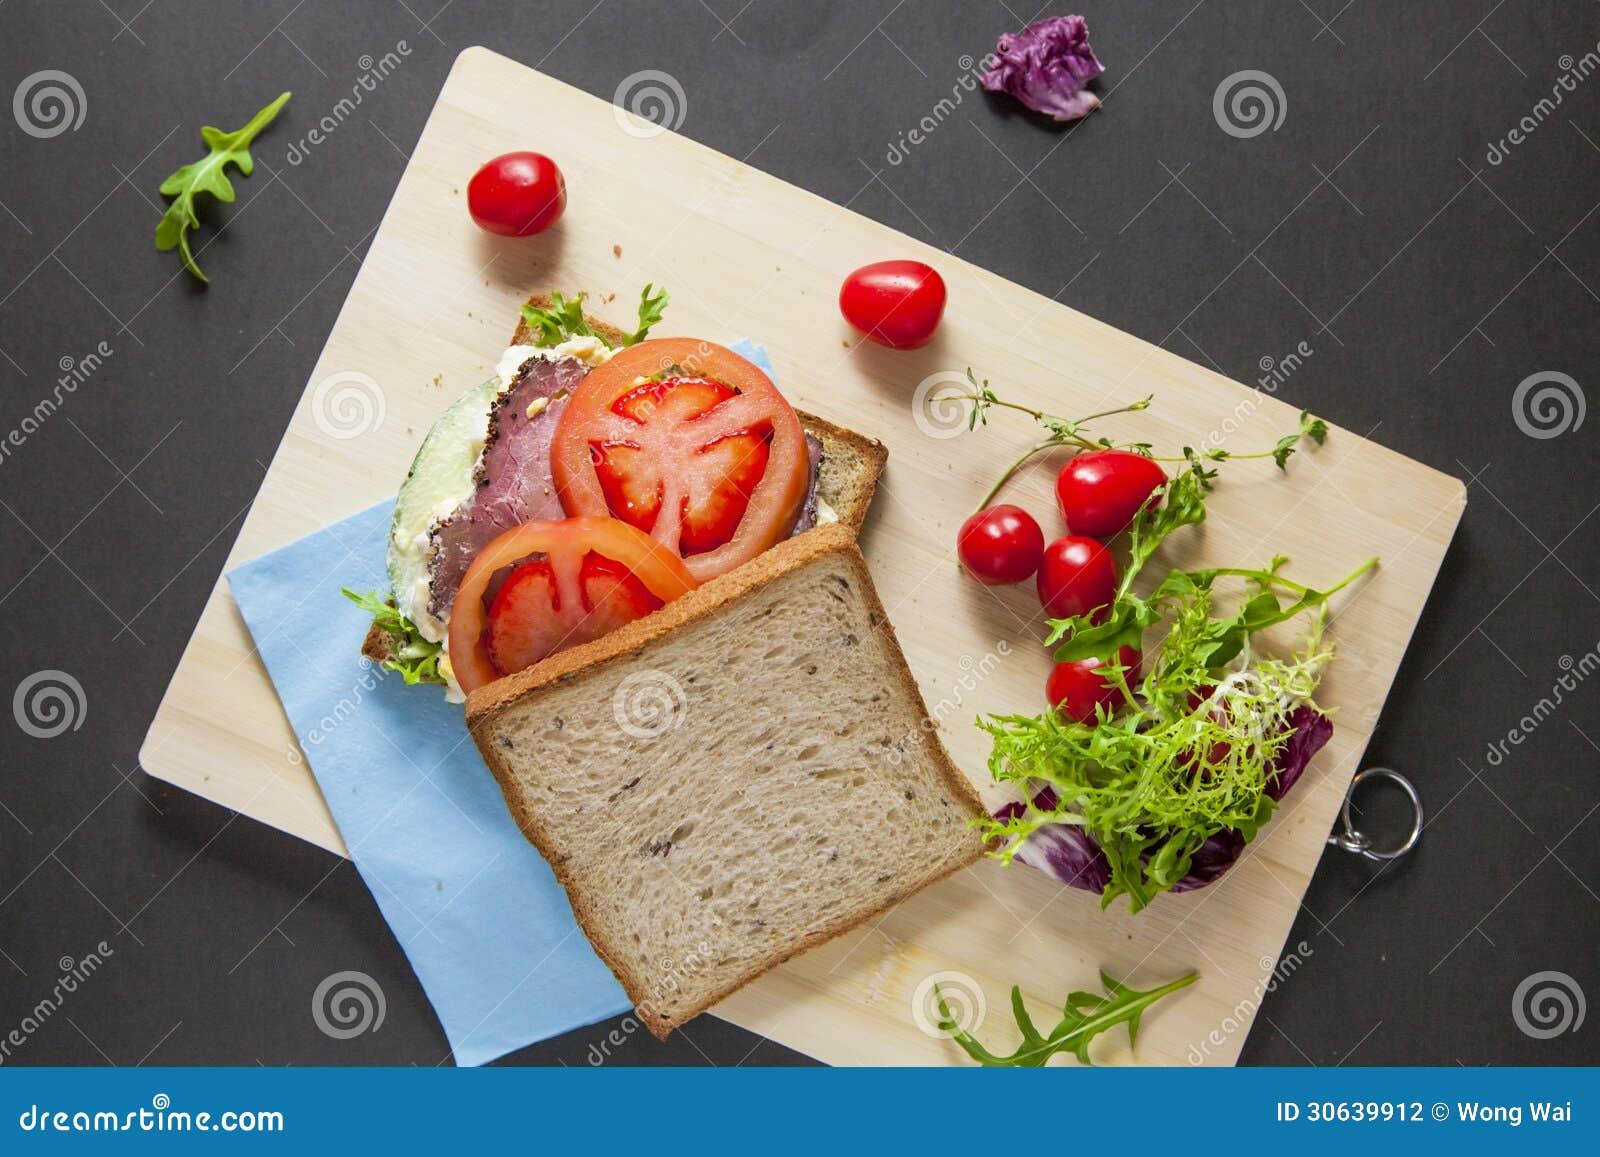 sandwiches-bacon-lettuce-broken-egg-salad-tomato-fresh-tomato-lettuce ...